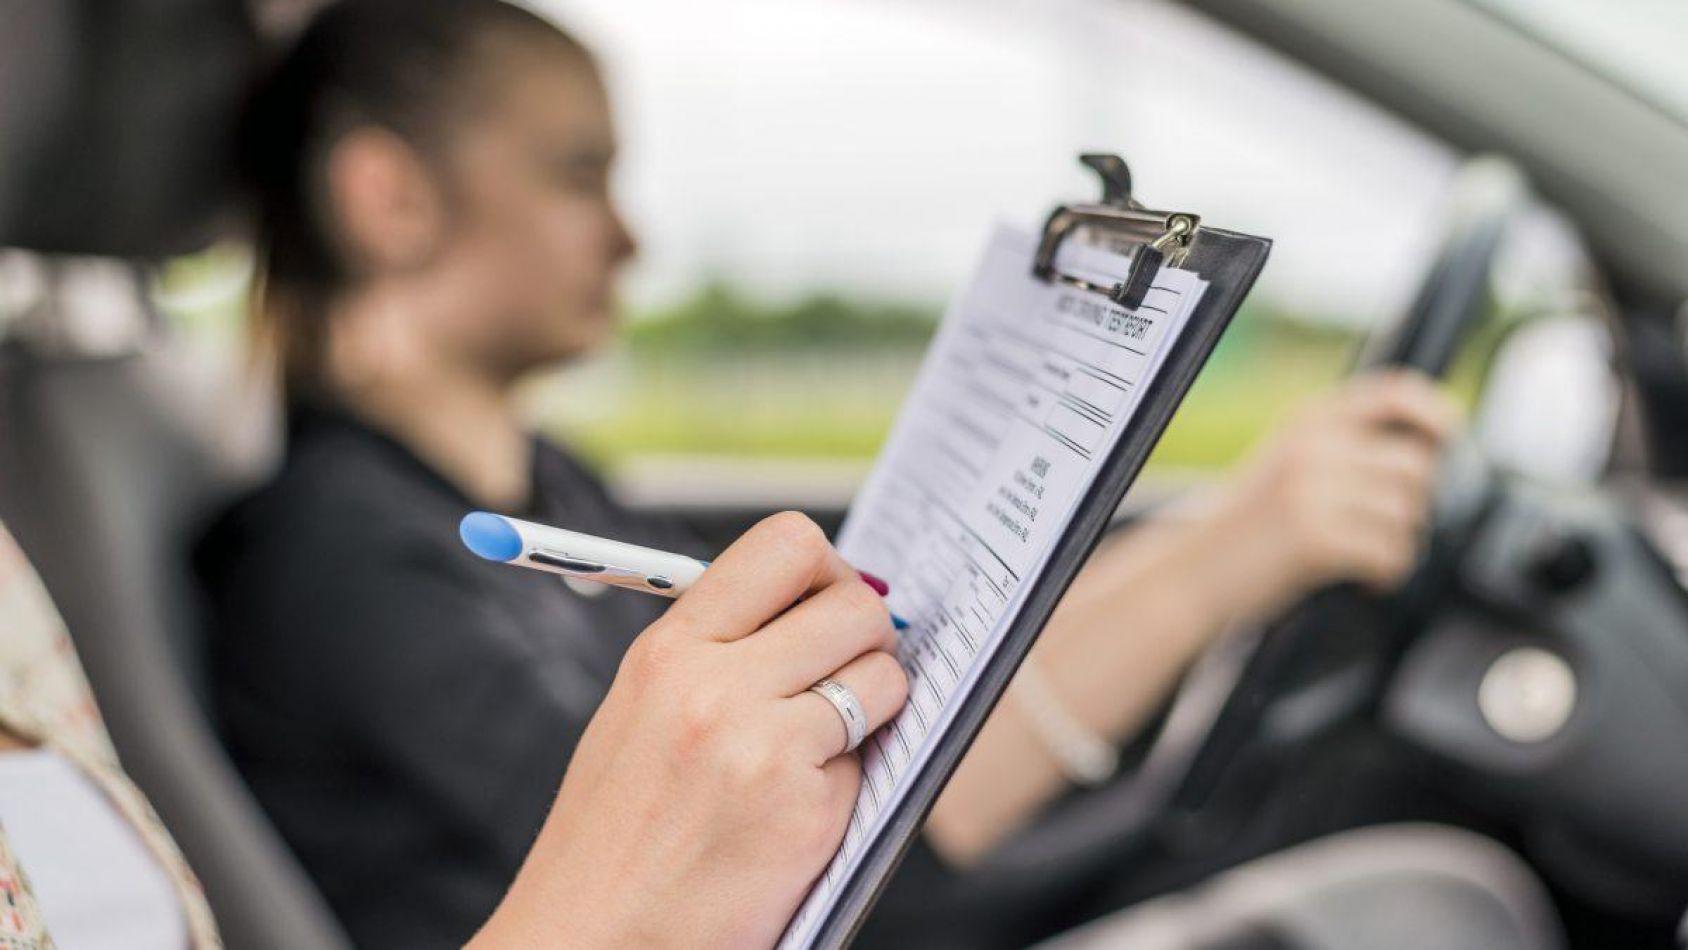 ¿Vas a sacar la licencia de conducir en Salta? ¡Leé esta nota!